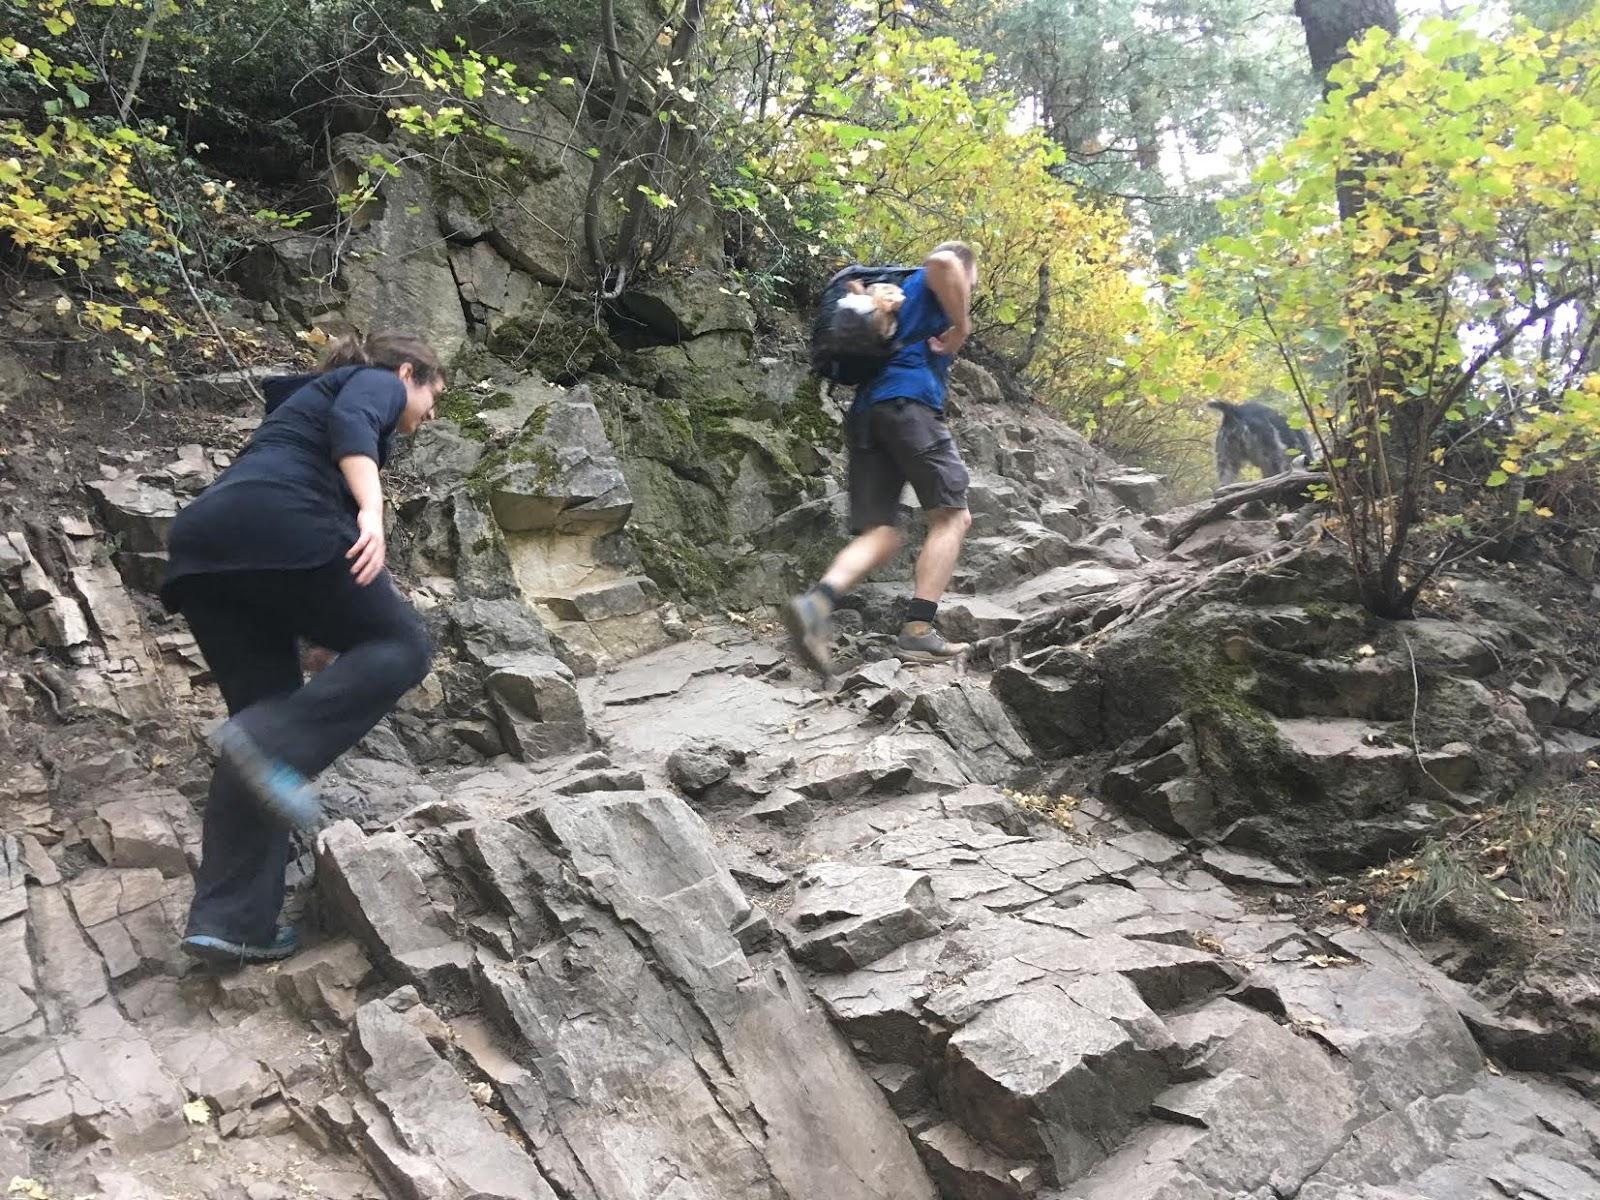 Hiking to Desolation Overlook, Hiking to the Salt Lake Overlook, Millcreek Canyon